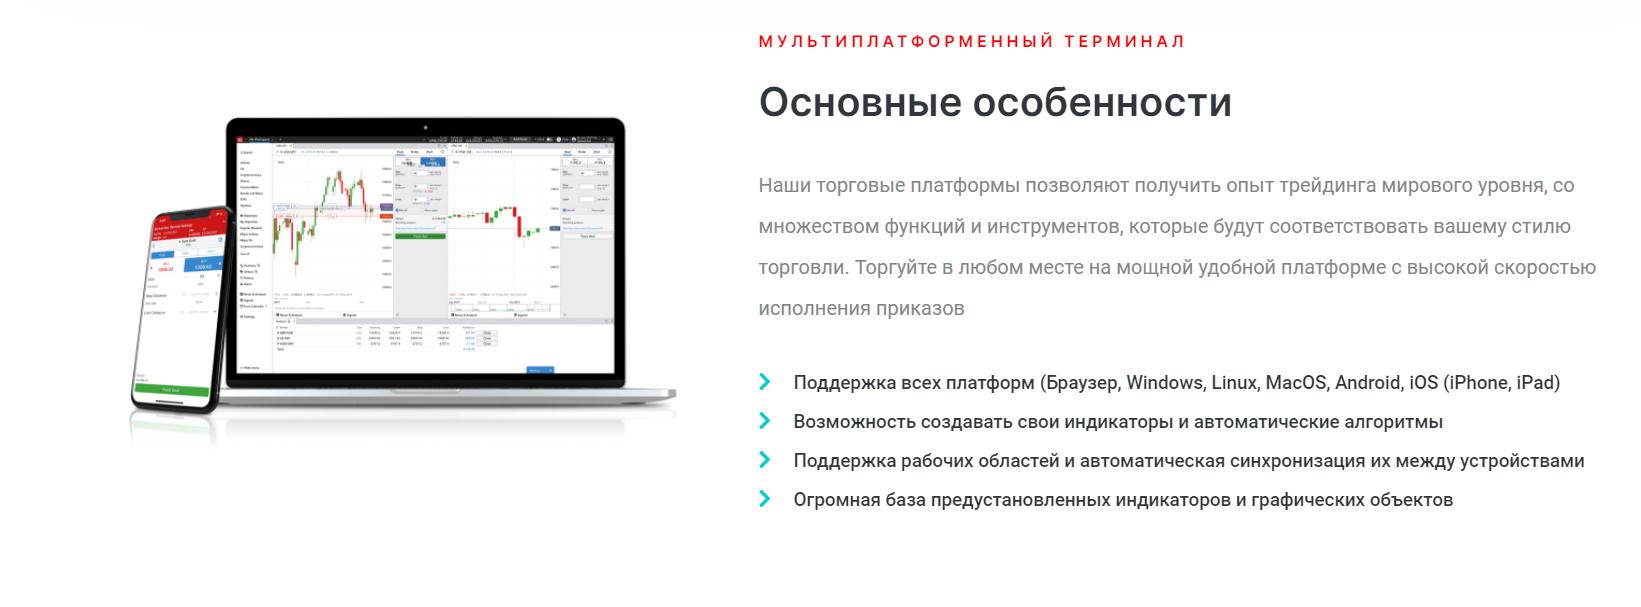 Оценка веб-ресурса BPCE Capital